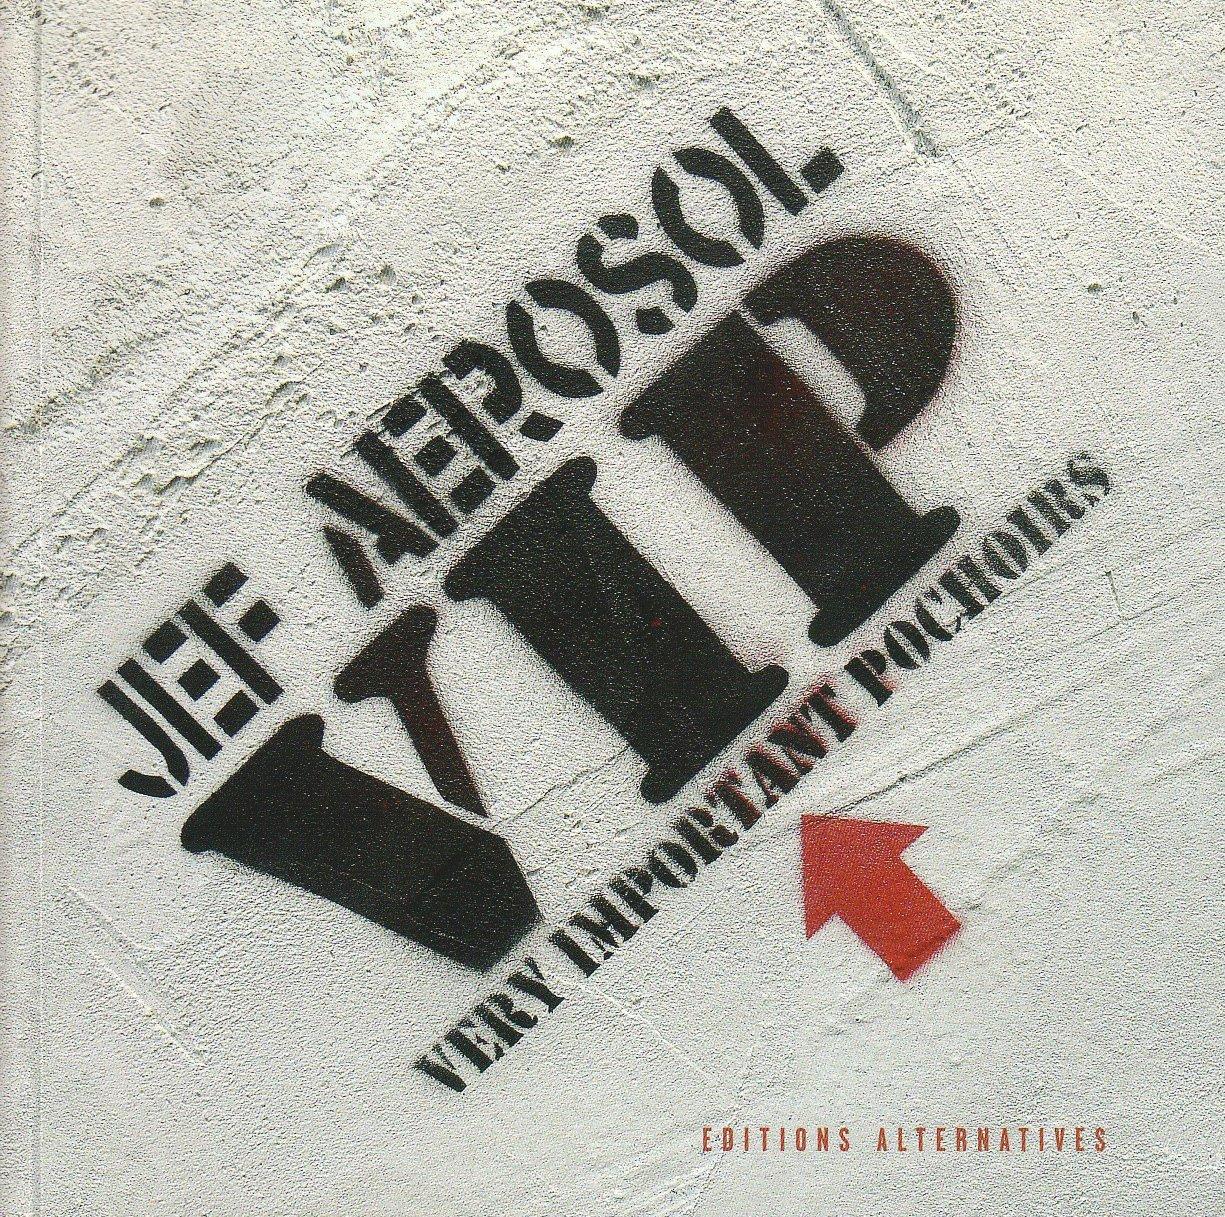 Image of JEF AEROSOL VIP VERY IMPORTANT POCHOIRS